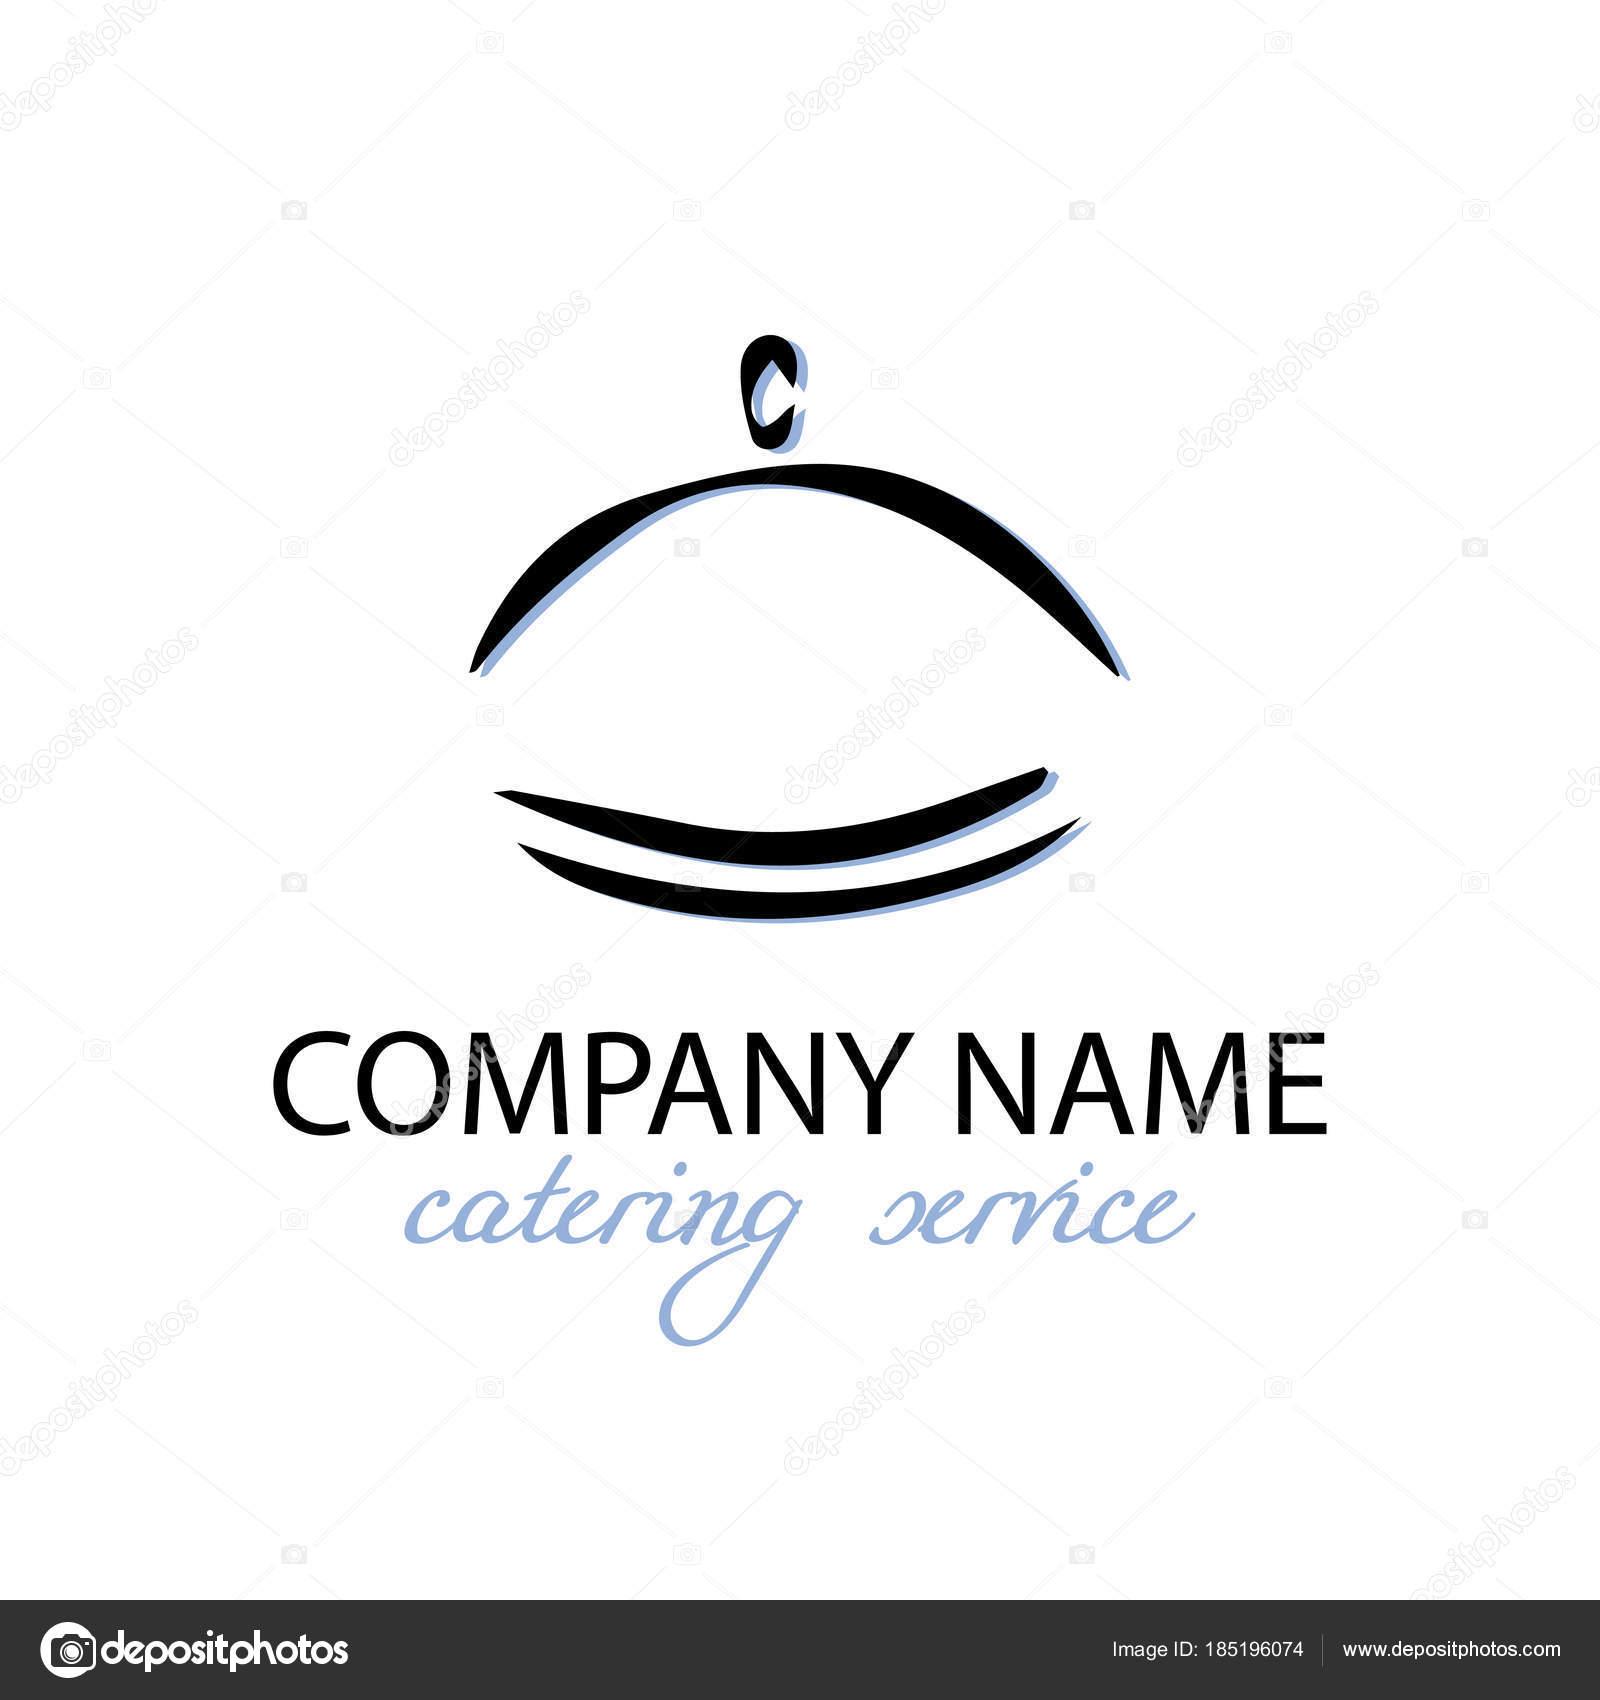 Kitchen Logo Design Ideas ~ Template for logo design kitchen restaurant and catering